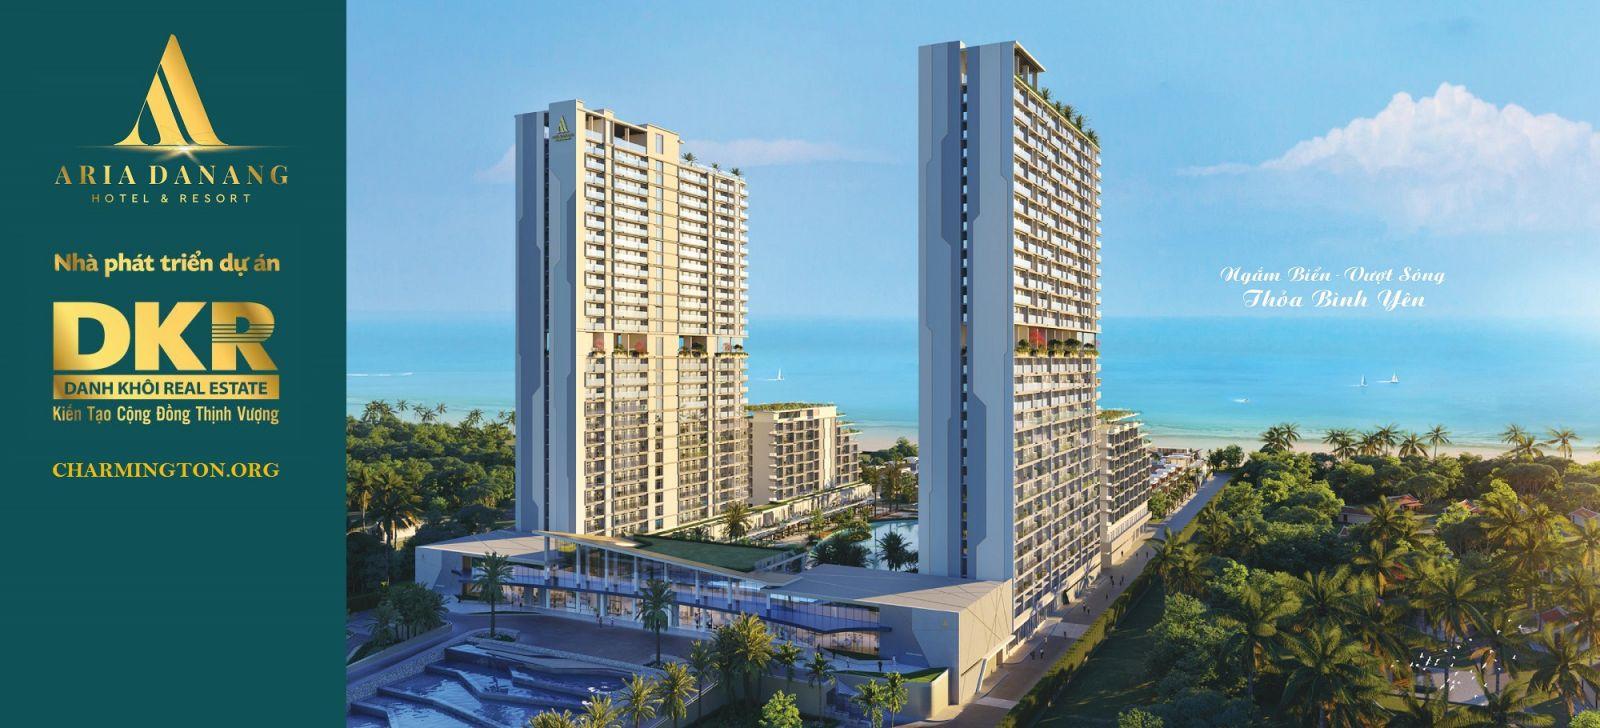 Aria Da Nang Hotel & Resort charmington.org